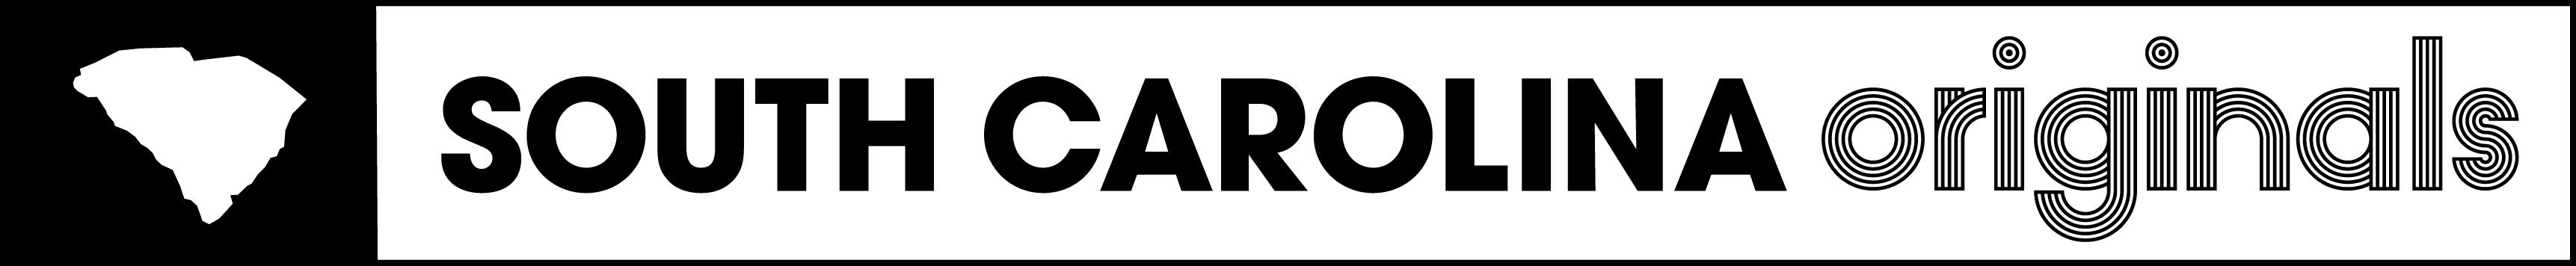 Sc banner